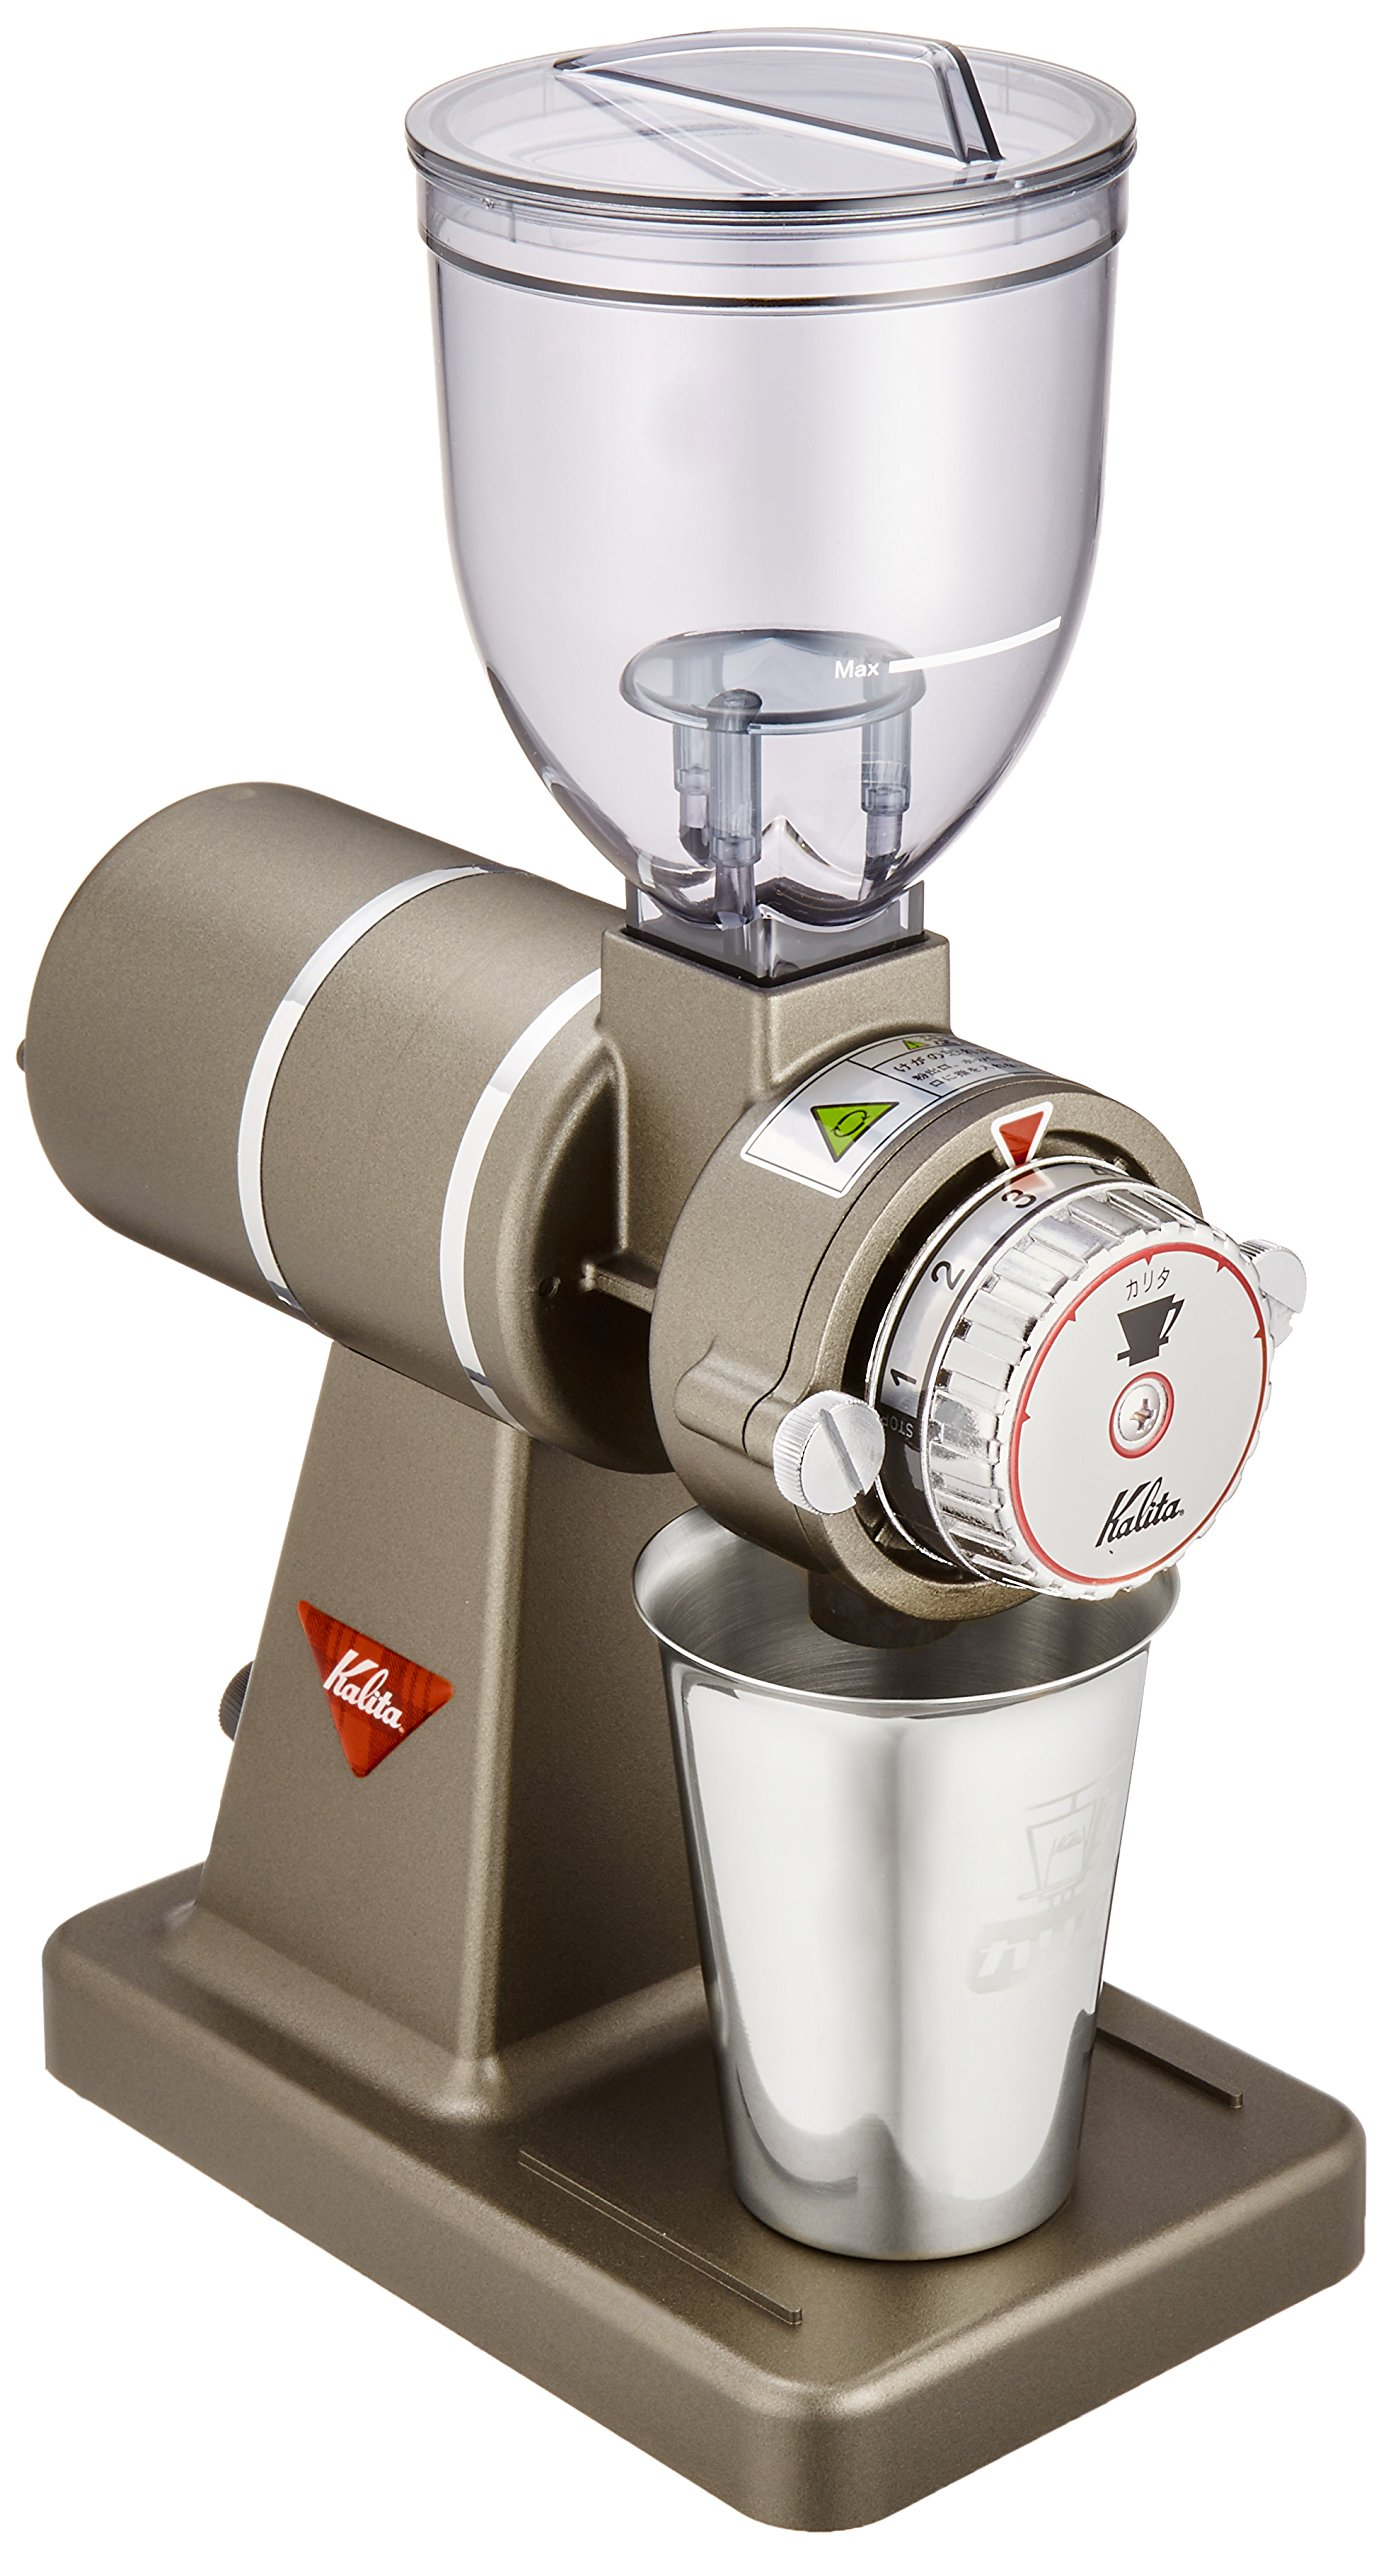 Kalita Electric Coffee Mill ''Nice cut G'' (Classic iron) 61101【Japan Domestic genuine products】